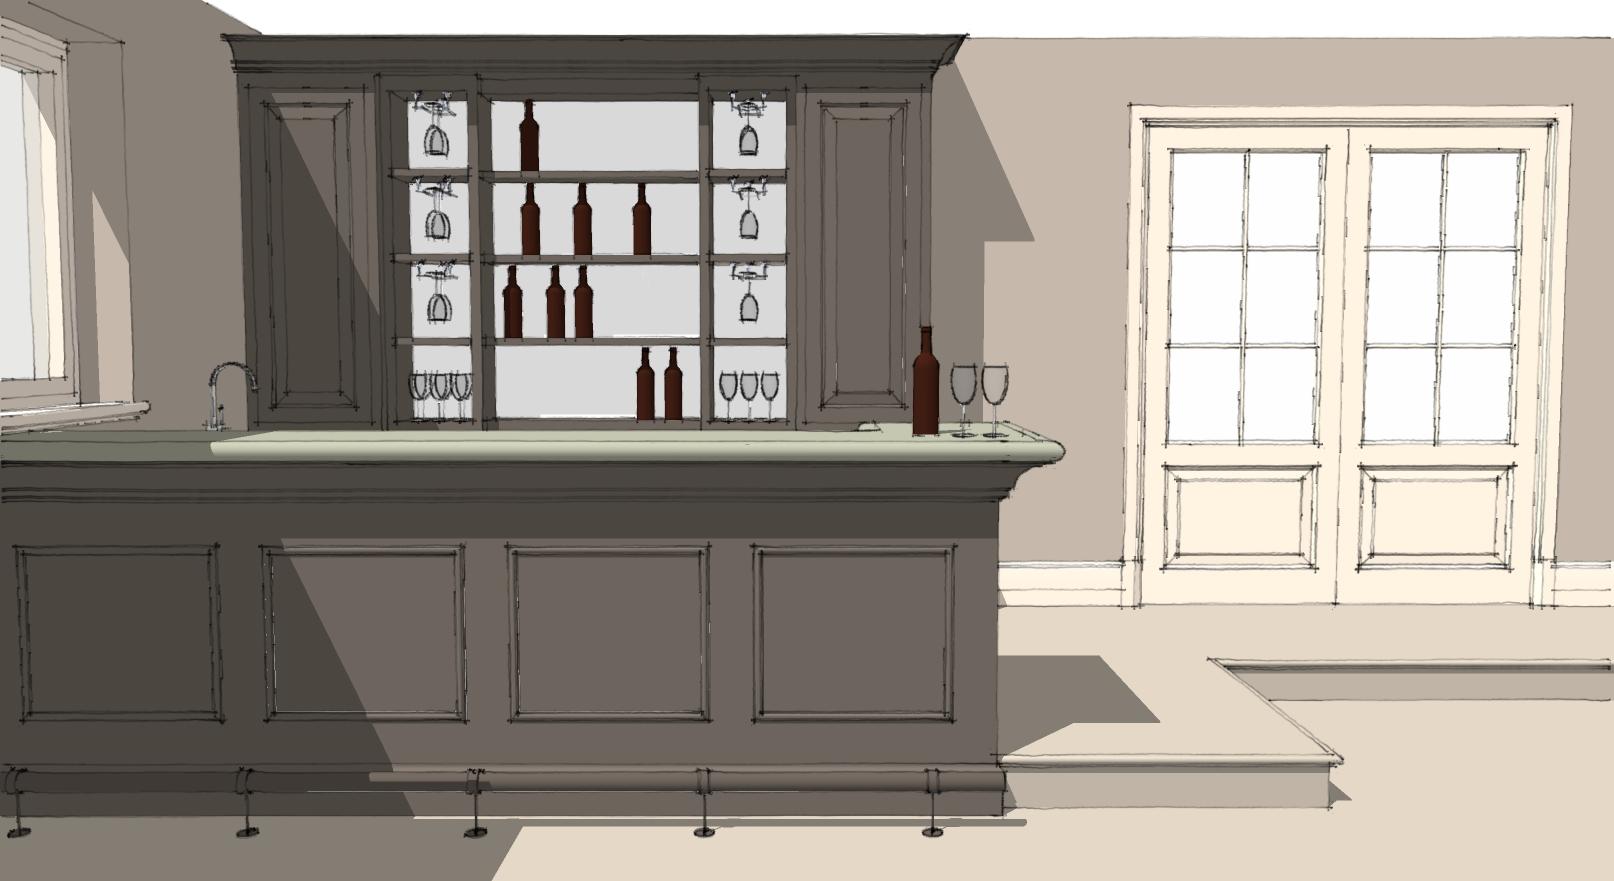 Bar design option